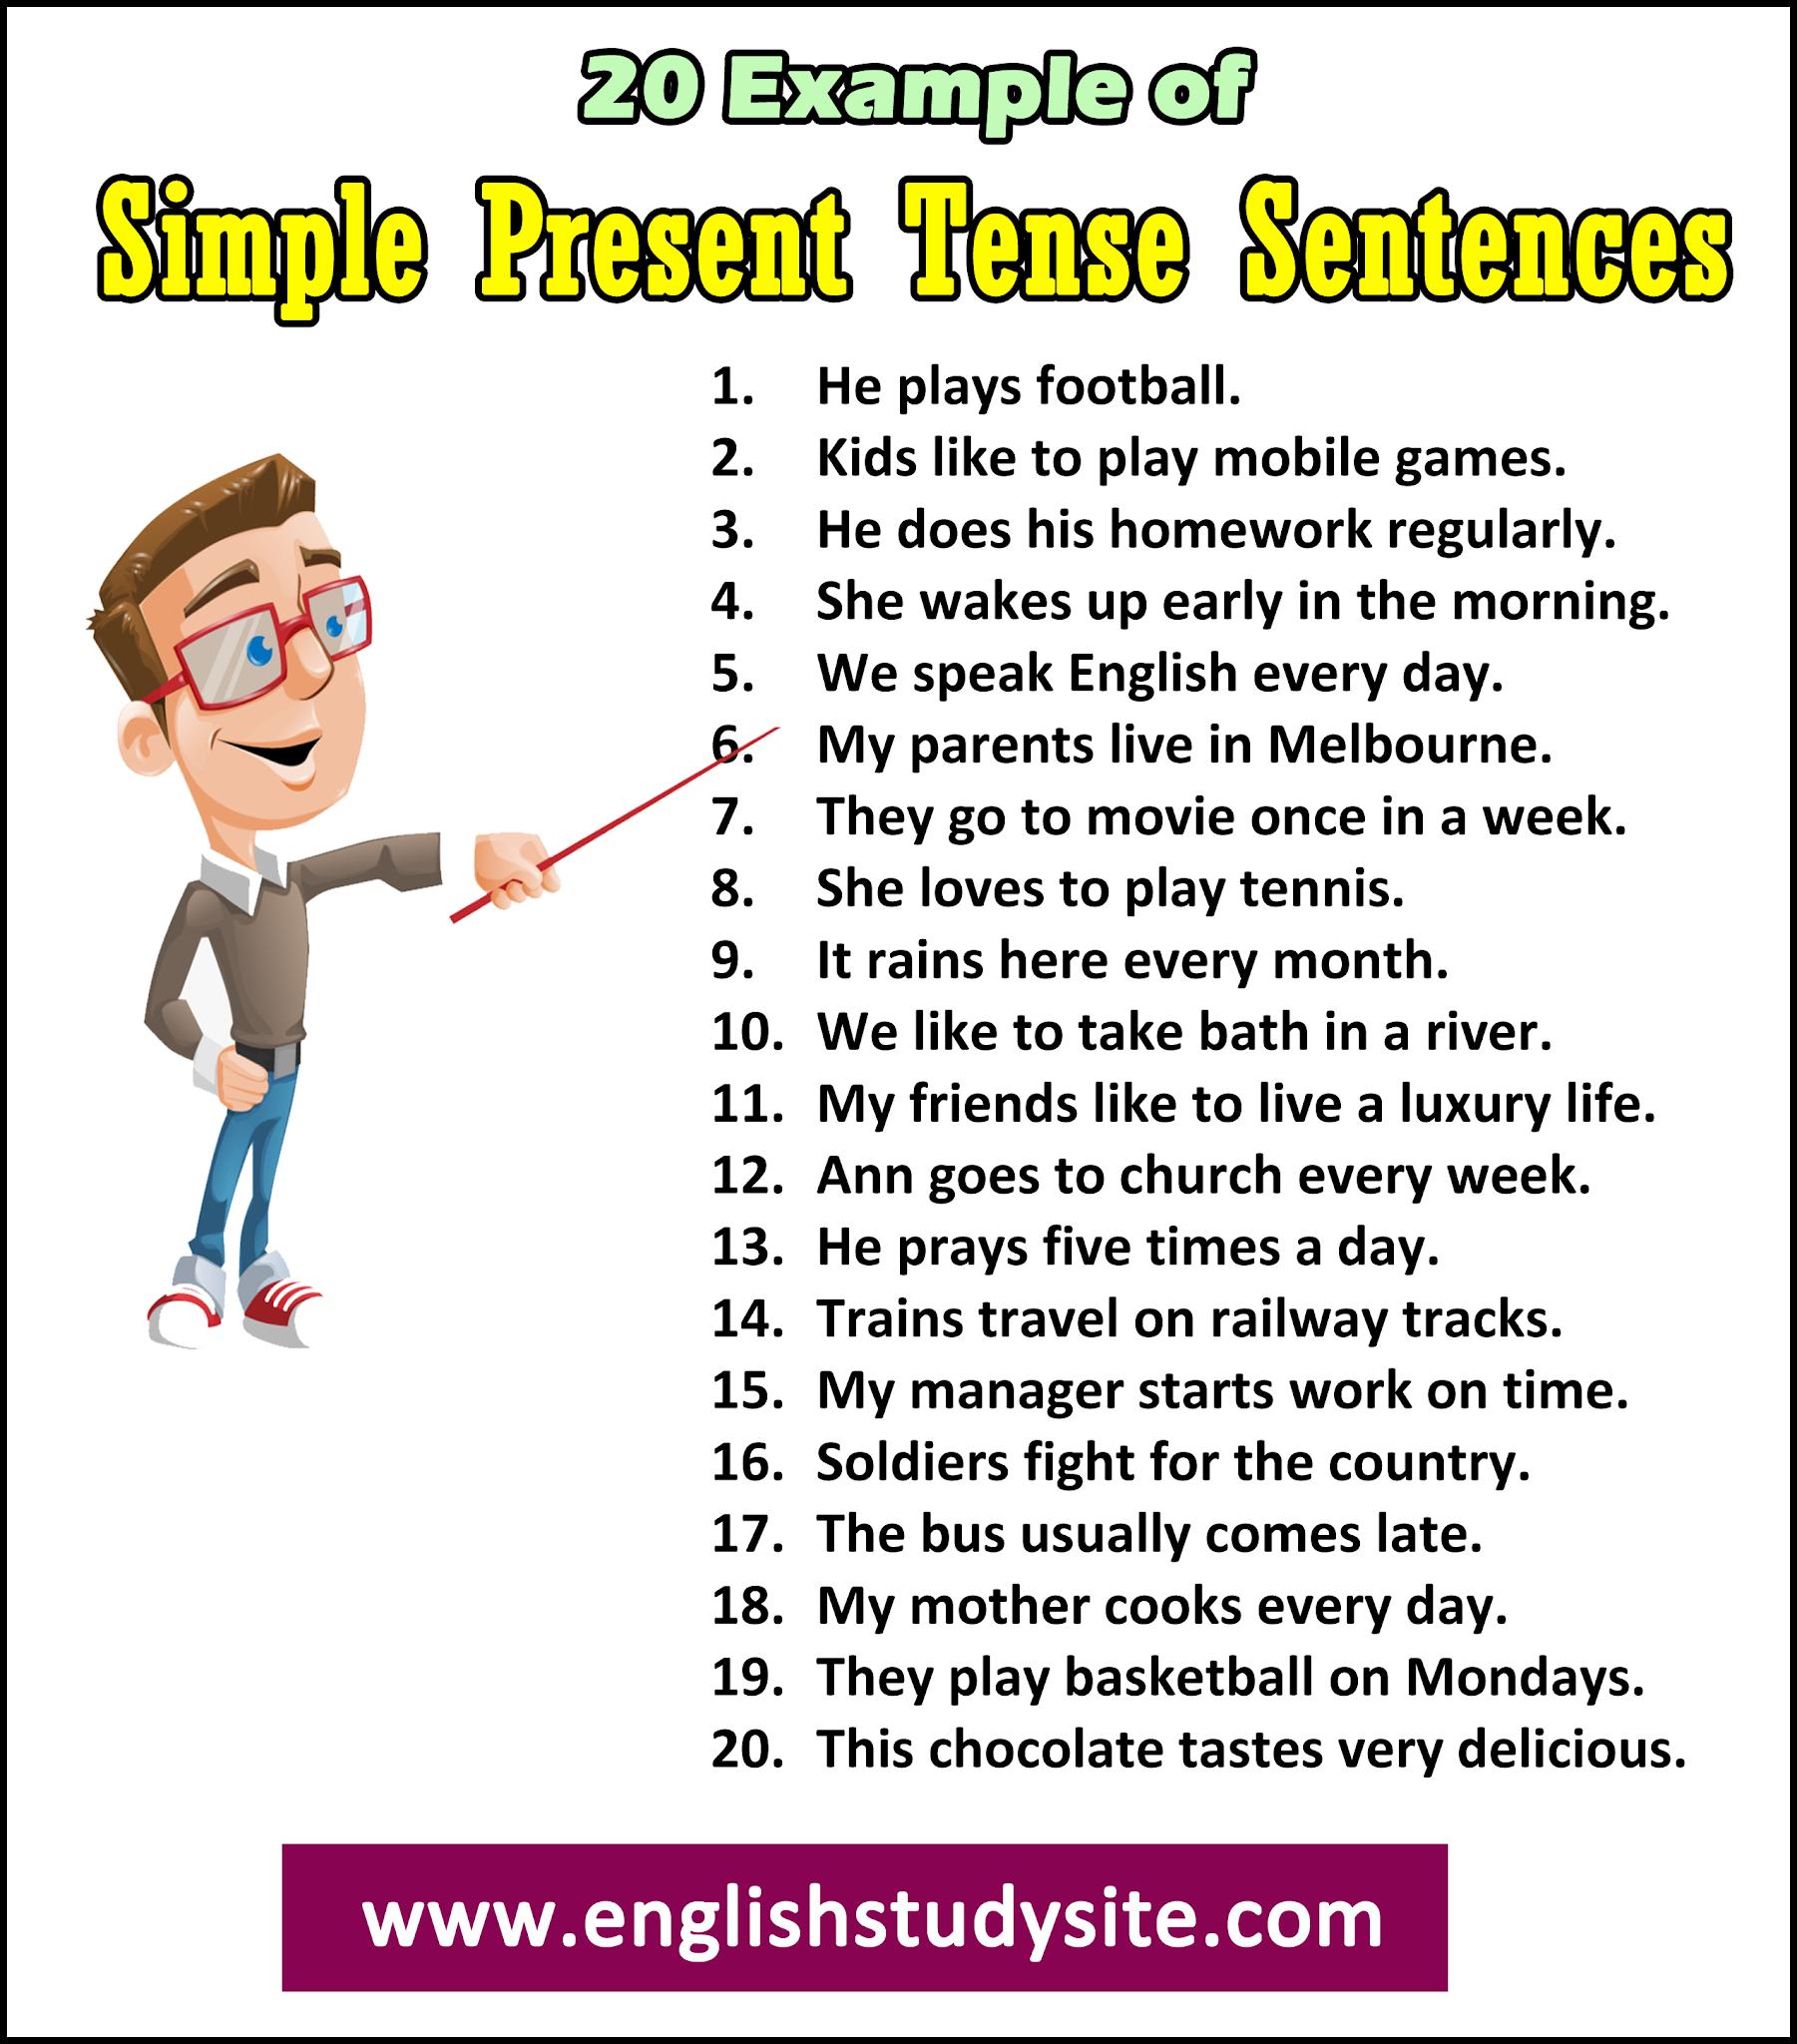 20 Example Sentences Of Simple Present Tense